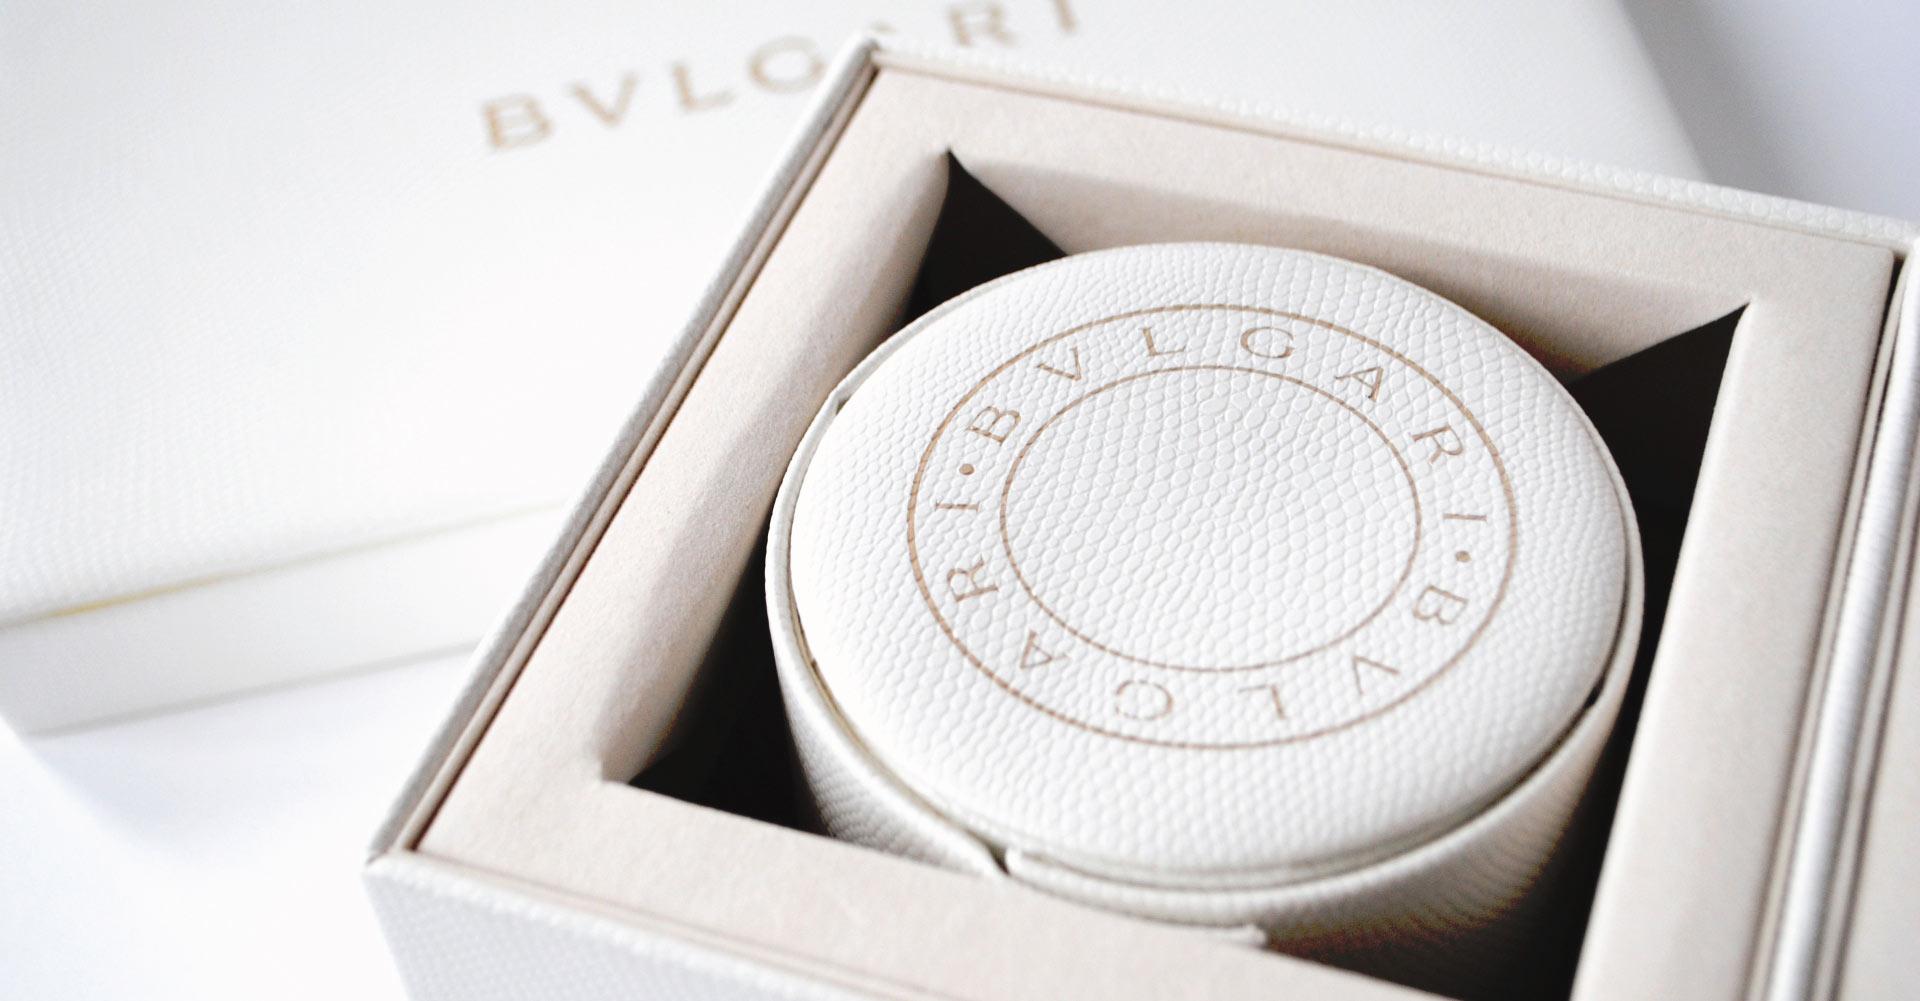 https://crpkg.com/clients/bvlgari-packaging